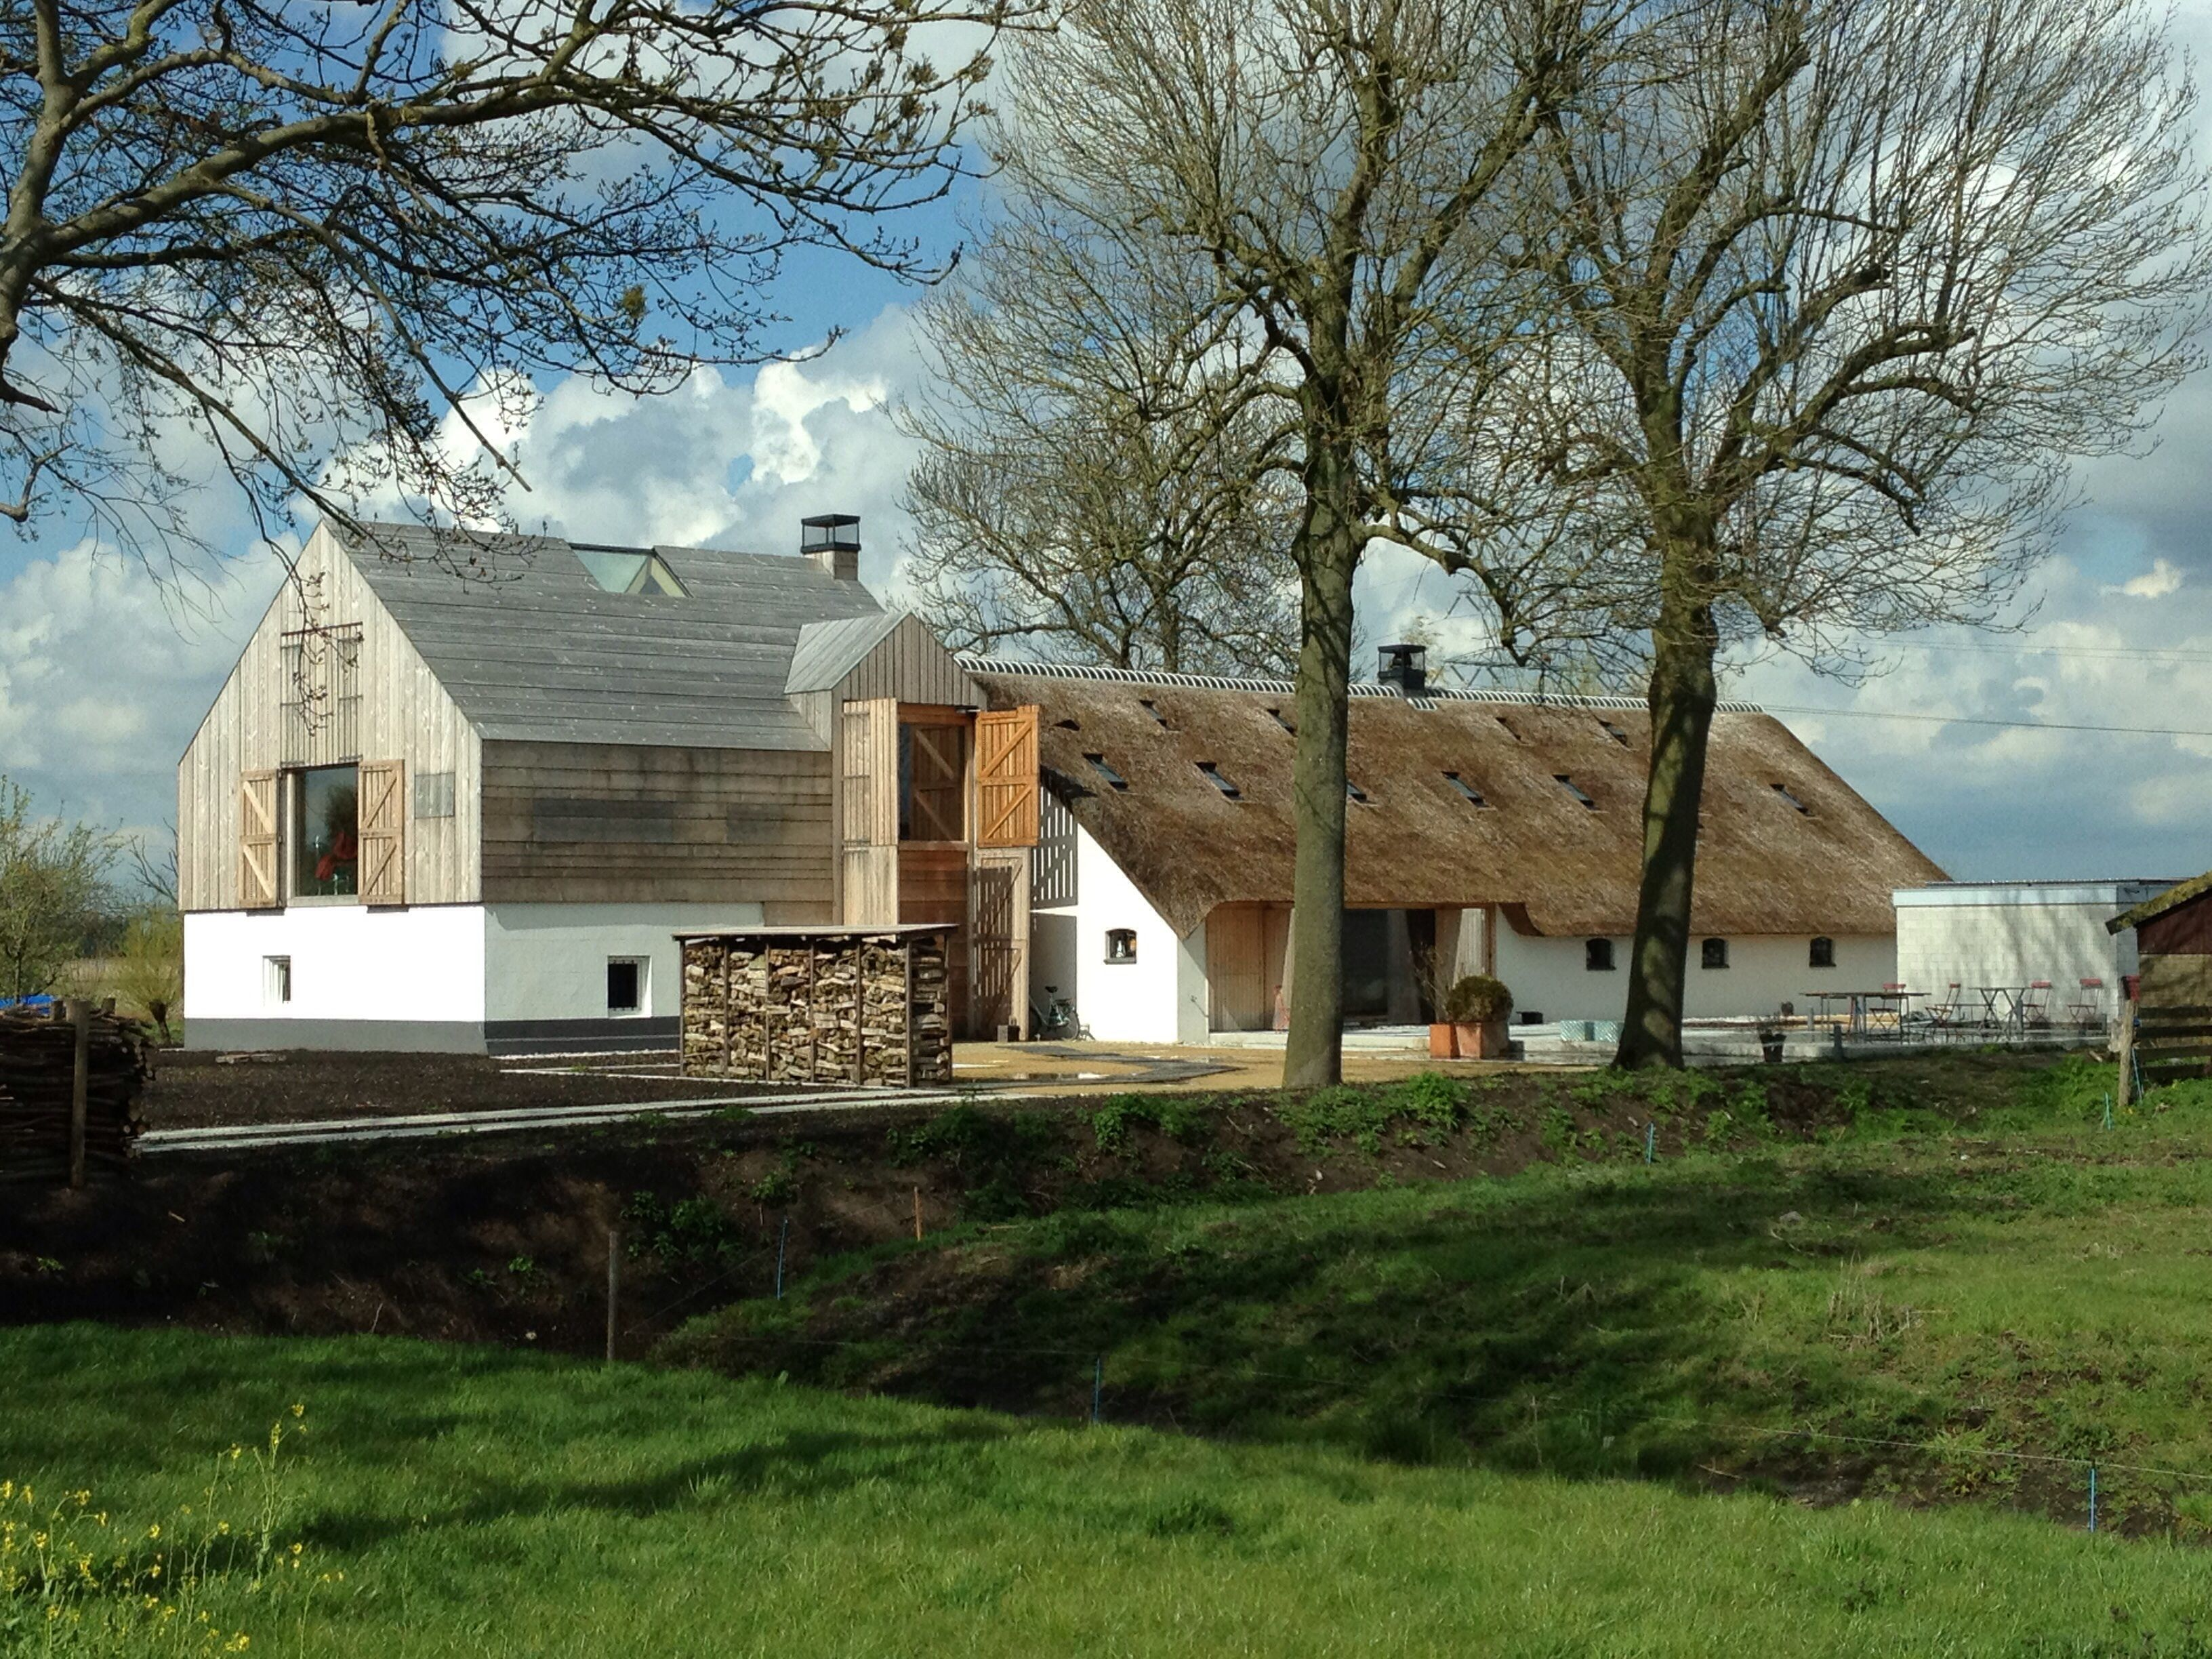 Boerderij architectuur architecture pinterest barn farming and architecture - Mohring architekten ...